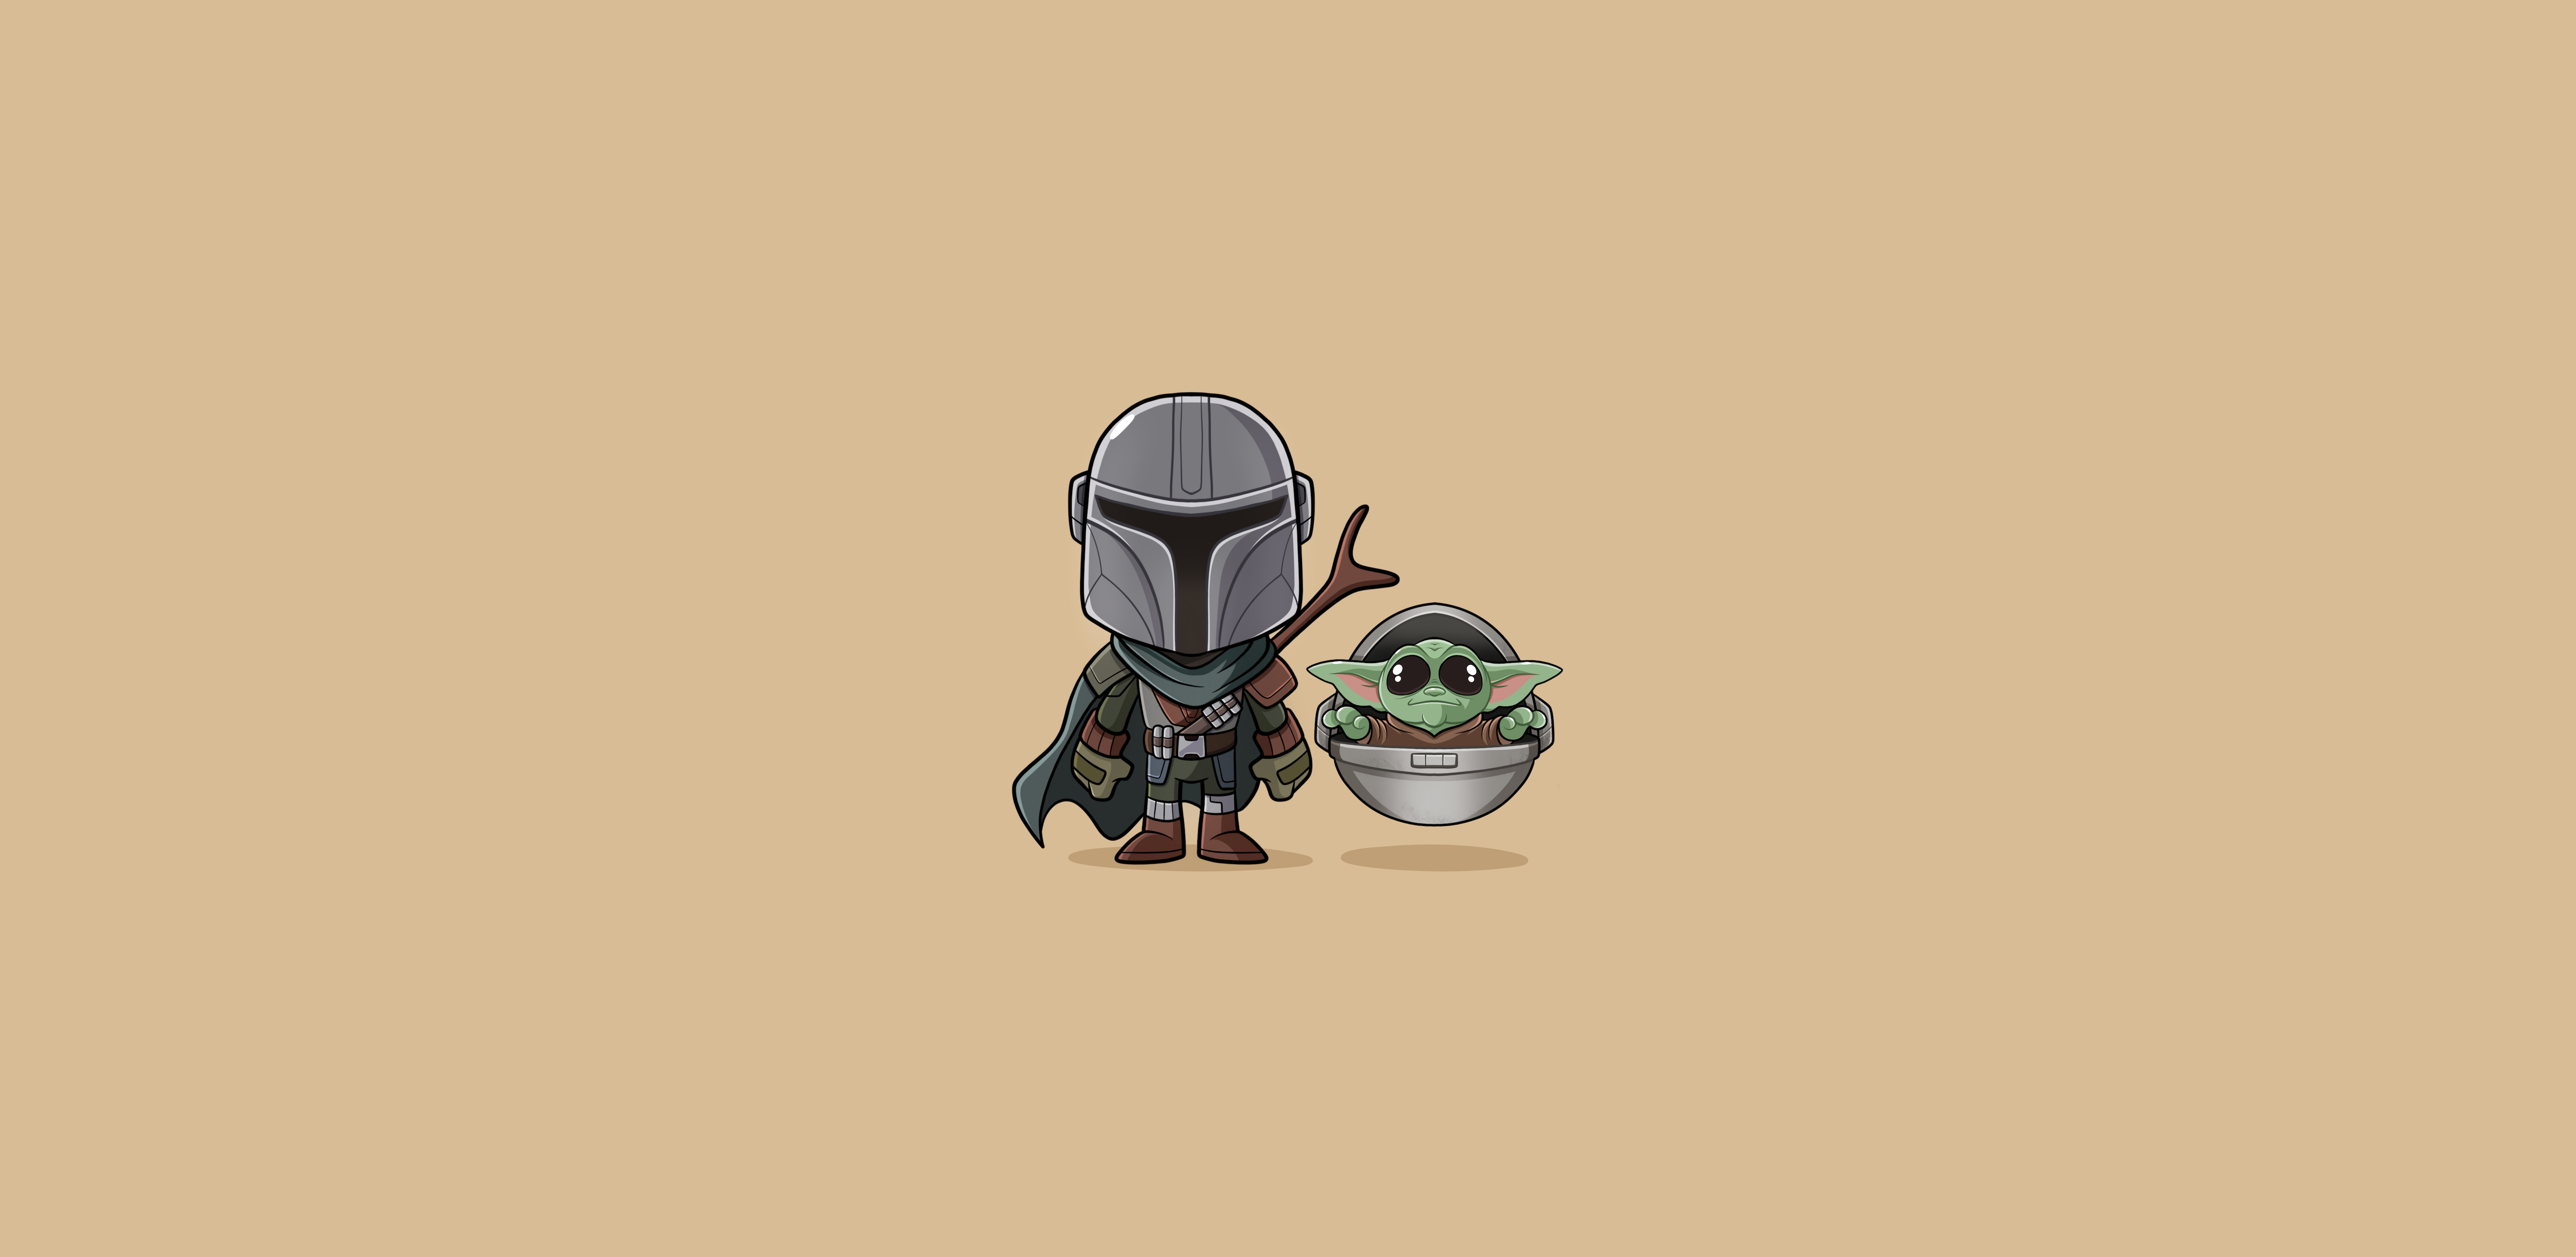 Baby Yoda Wallpaper 4k Cute